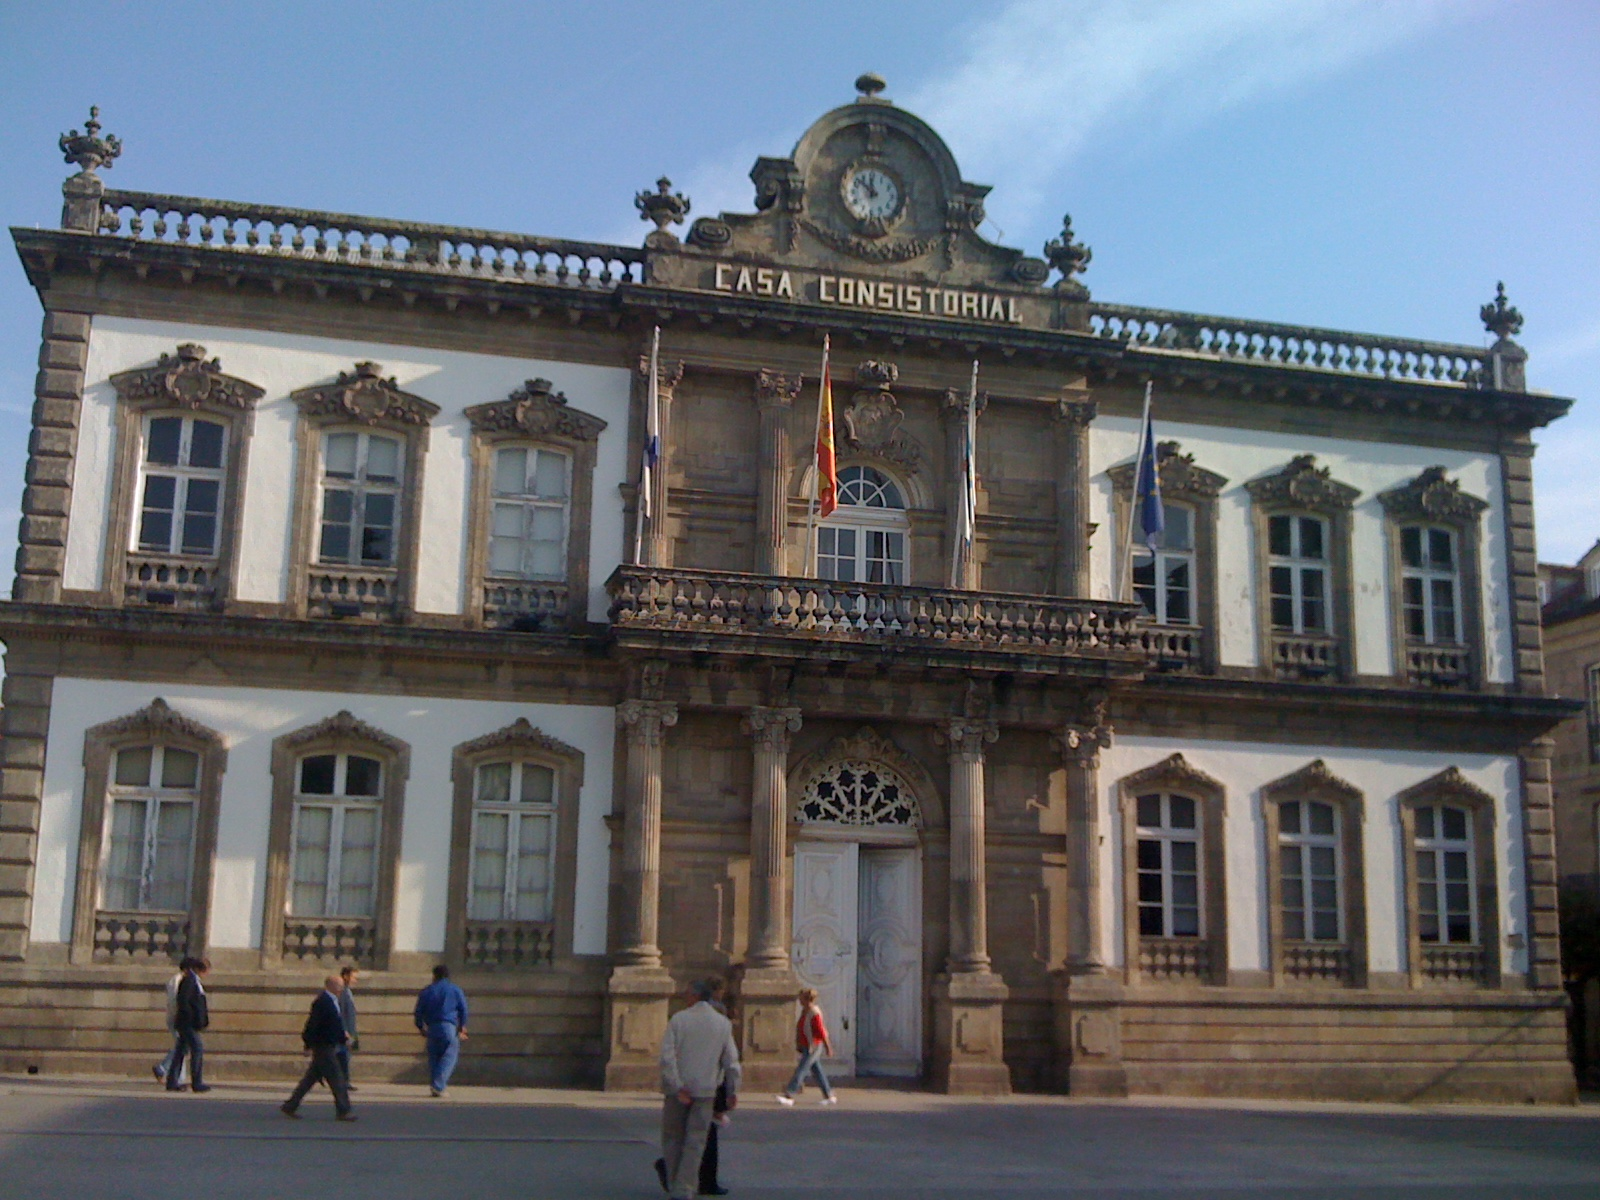 Vivir en pontevedra casa do concello de pontevedra - Mi casa pontevedra ...